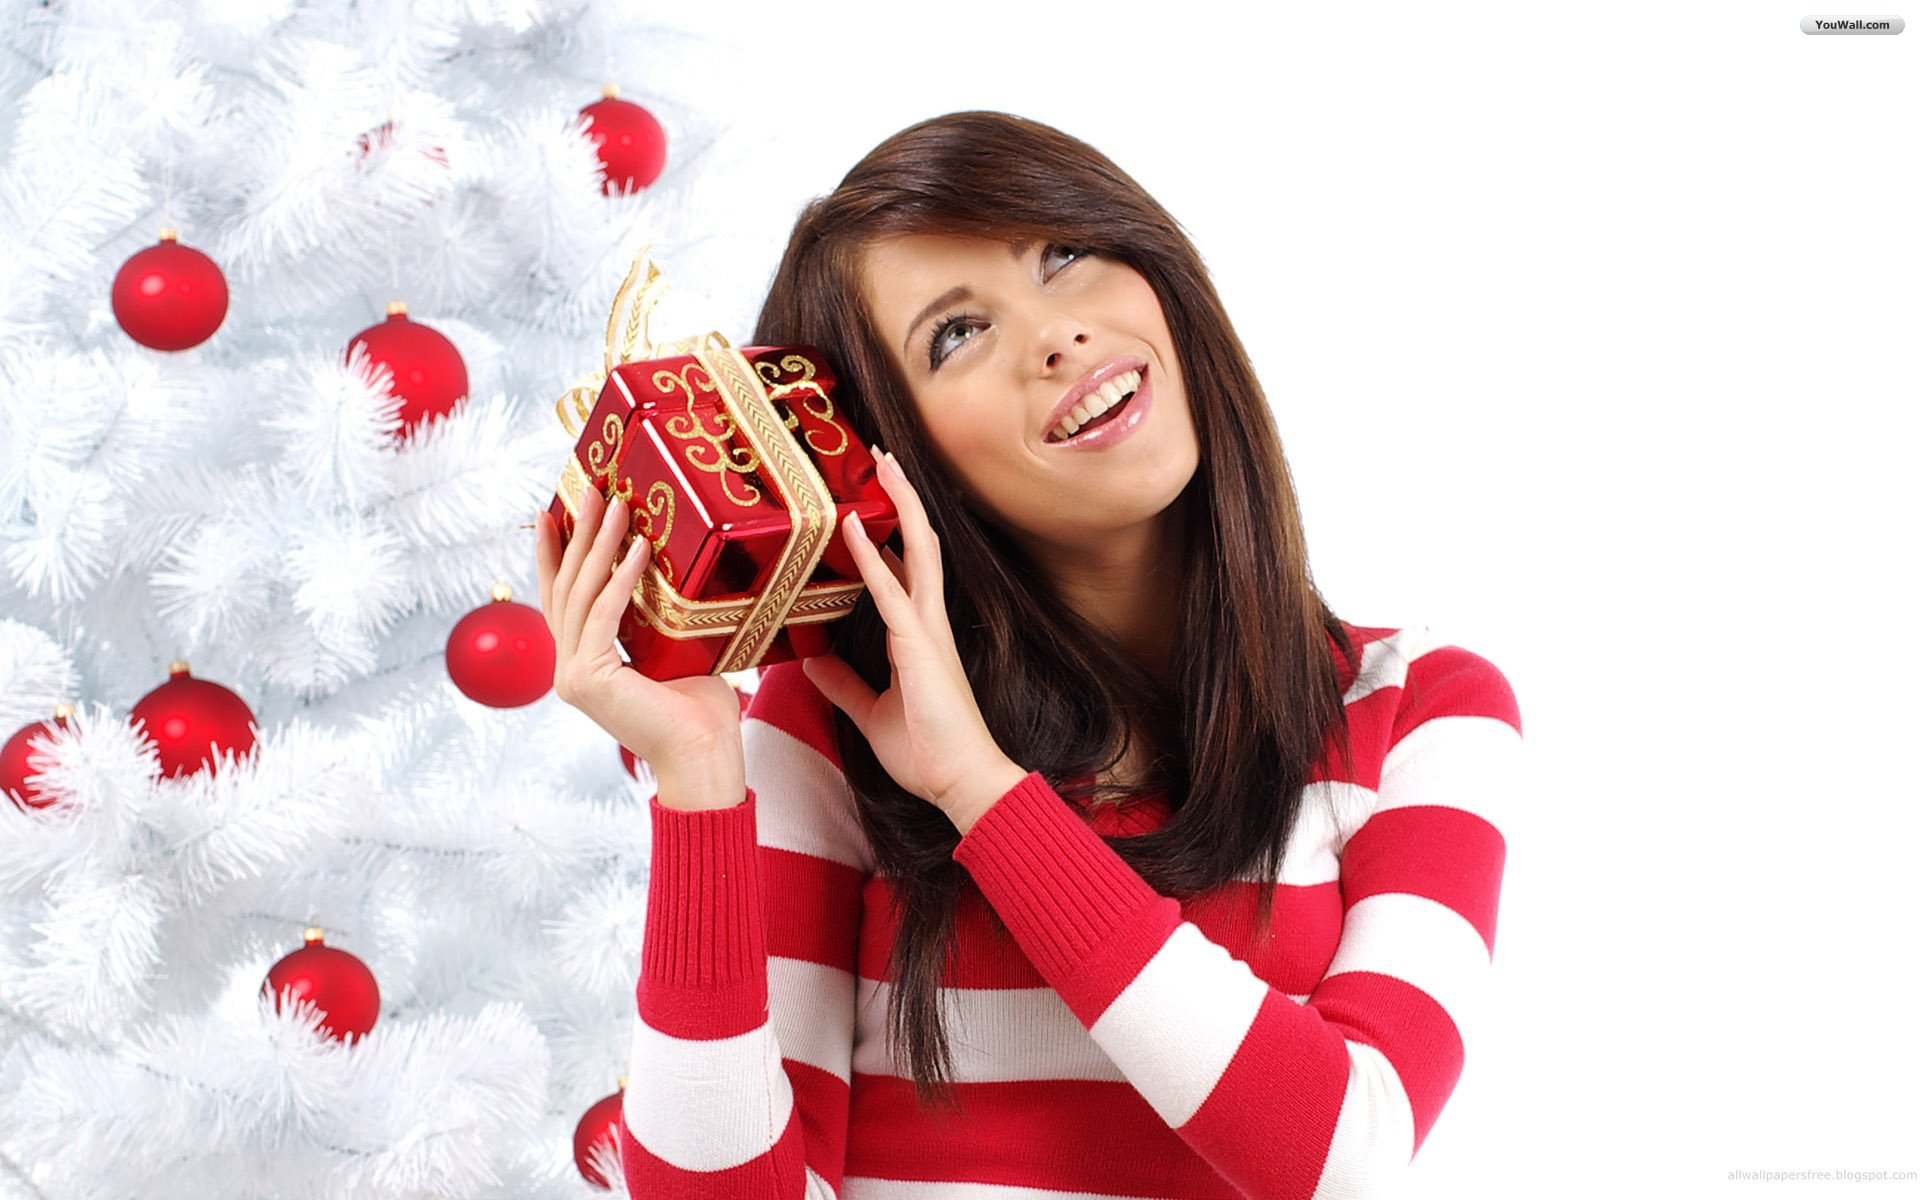 Christmas Girl Desktop Wallpaper 20780 - Baltana